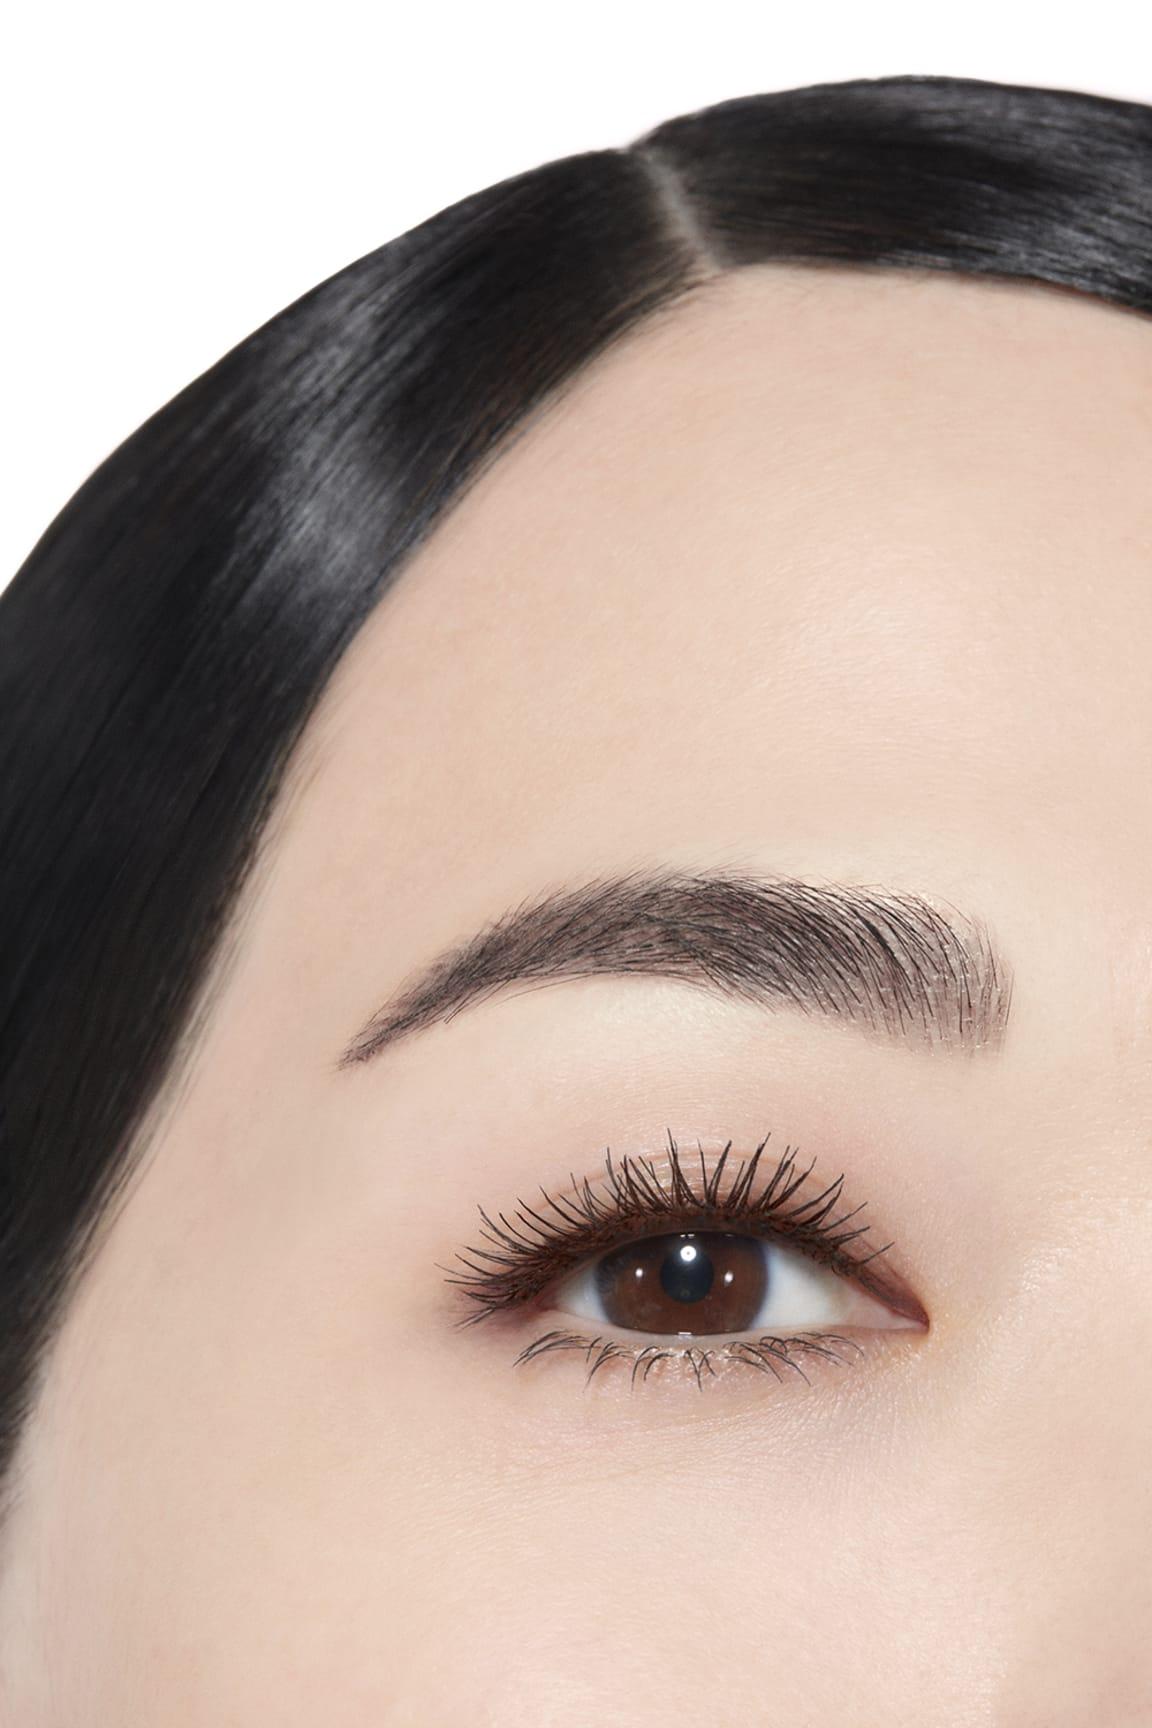 Application makeup visual 1 - LE VOLUME DE CHANEL WATERPROOF 20 - BRUN